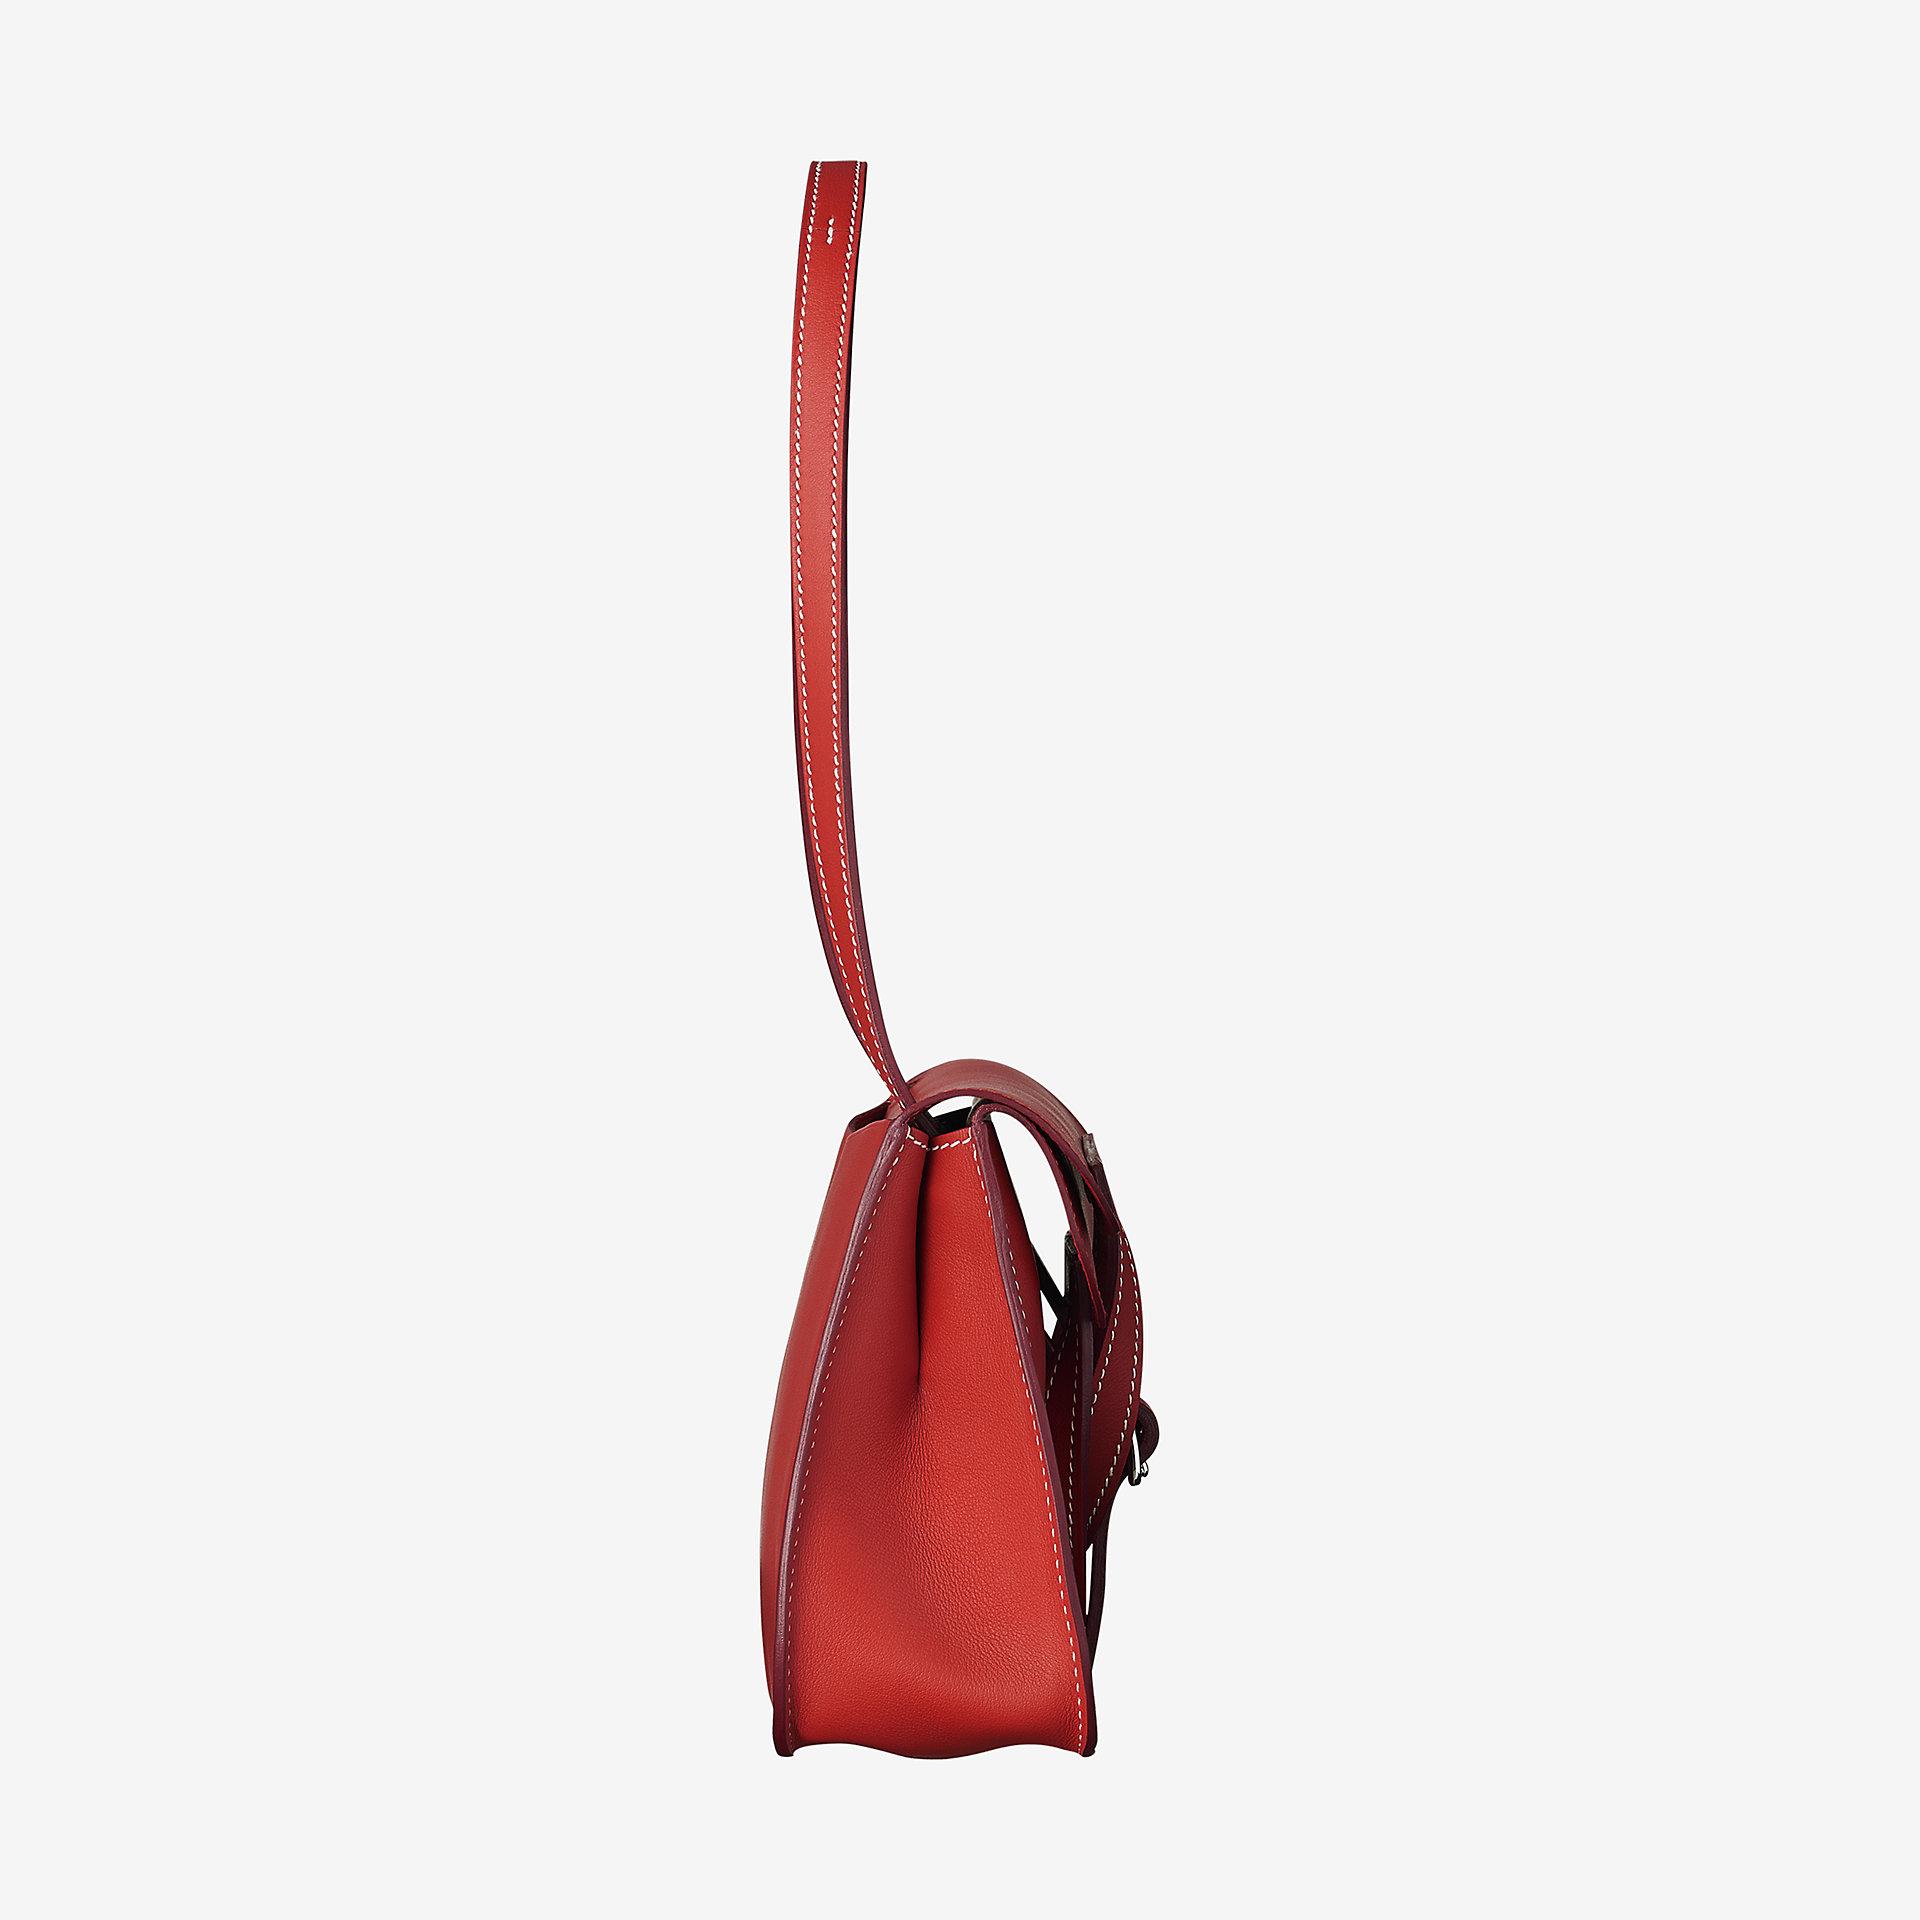 爱马仕Hermes Halzan mini bag rouge tomate Swift calfskin 小牛皮手提包